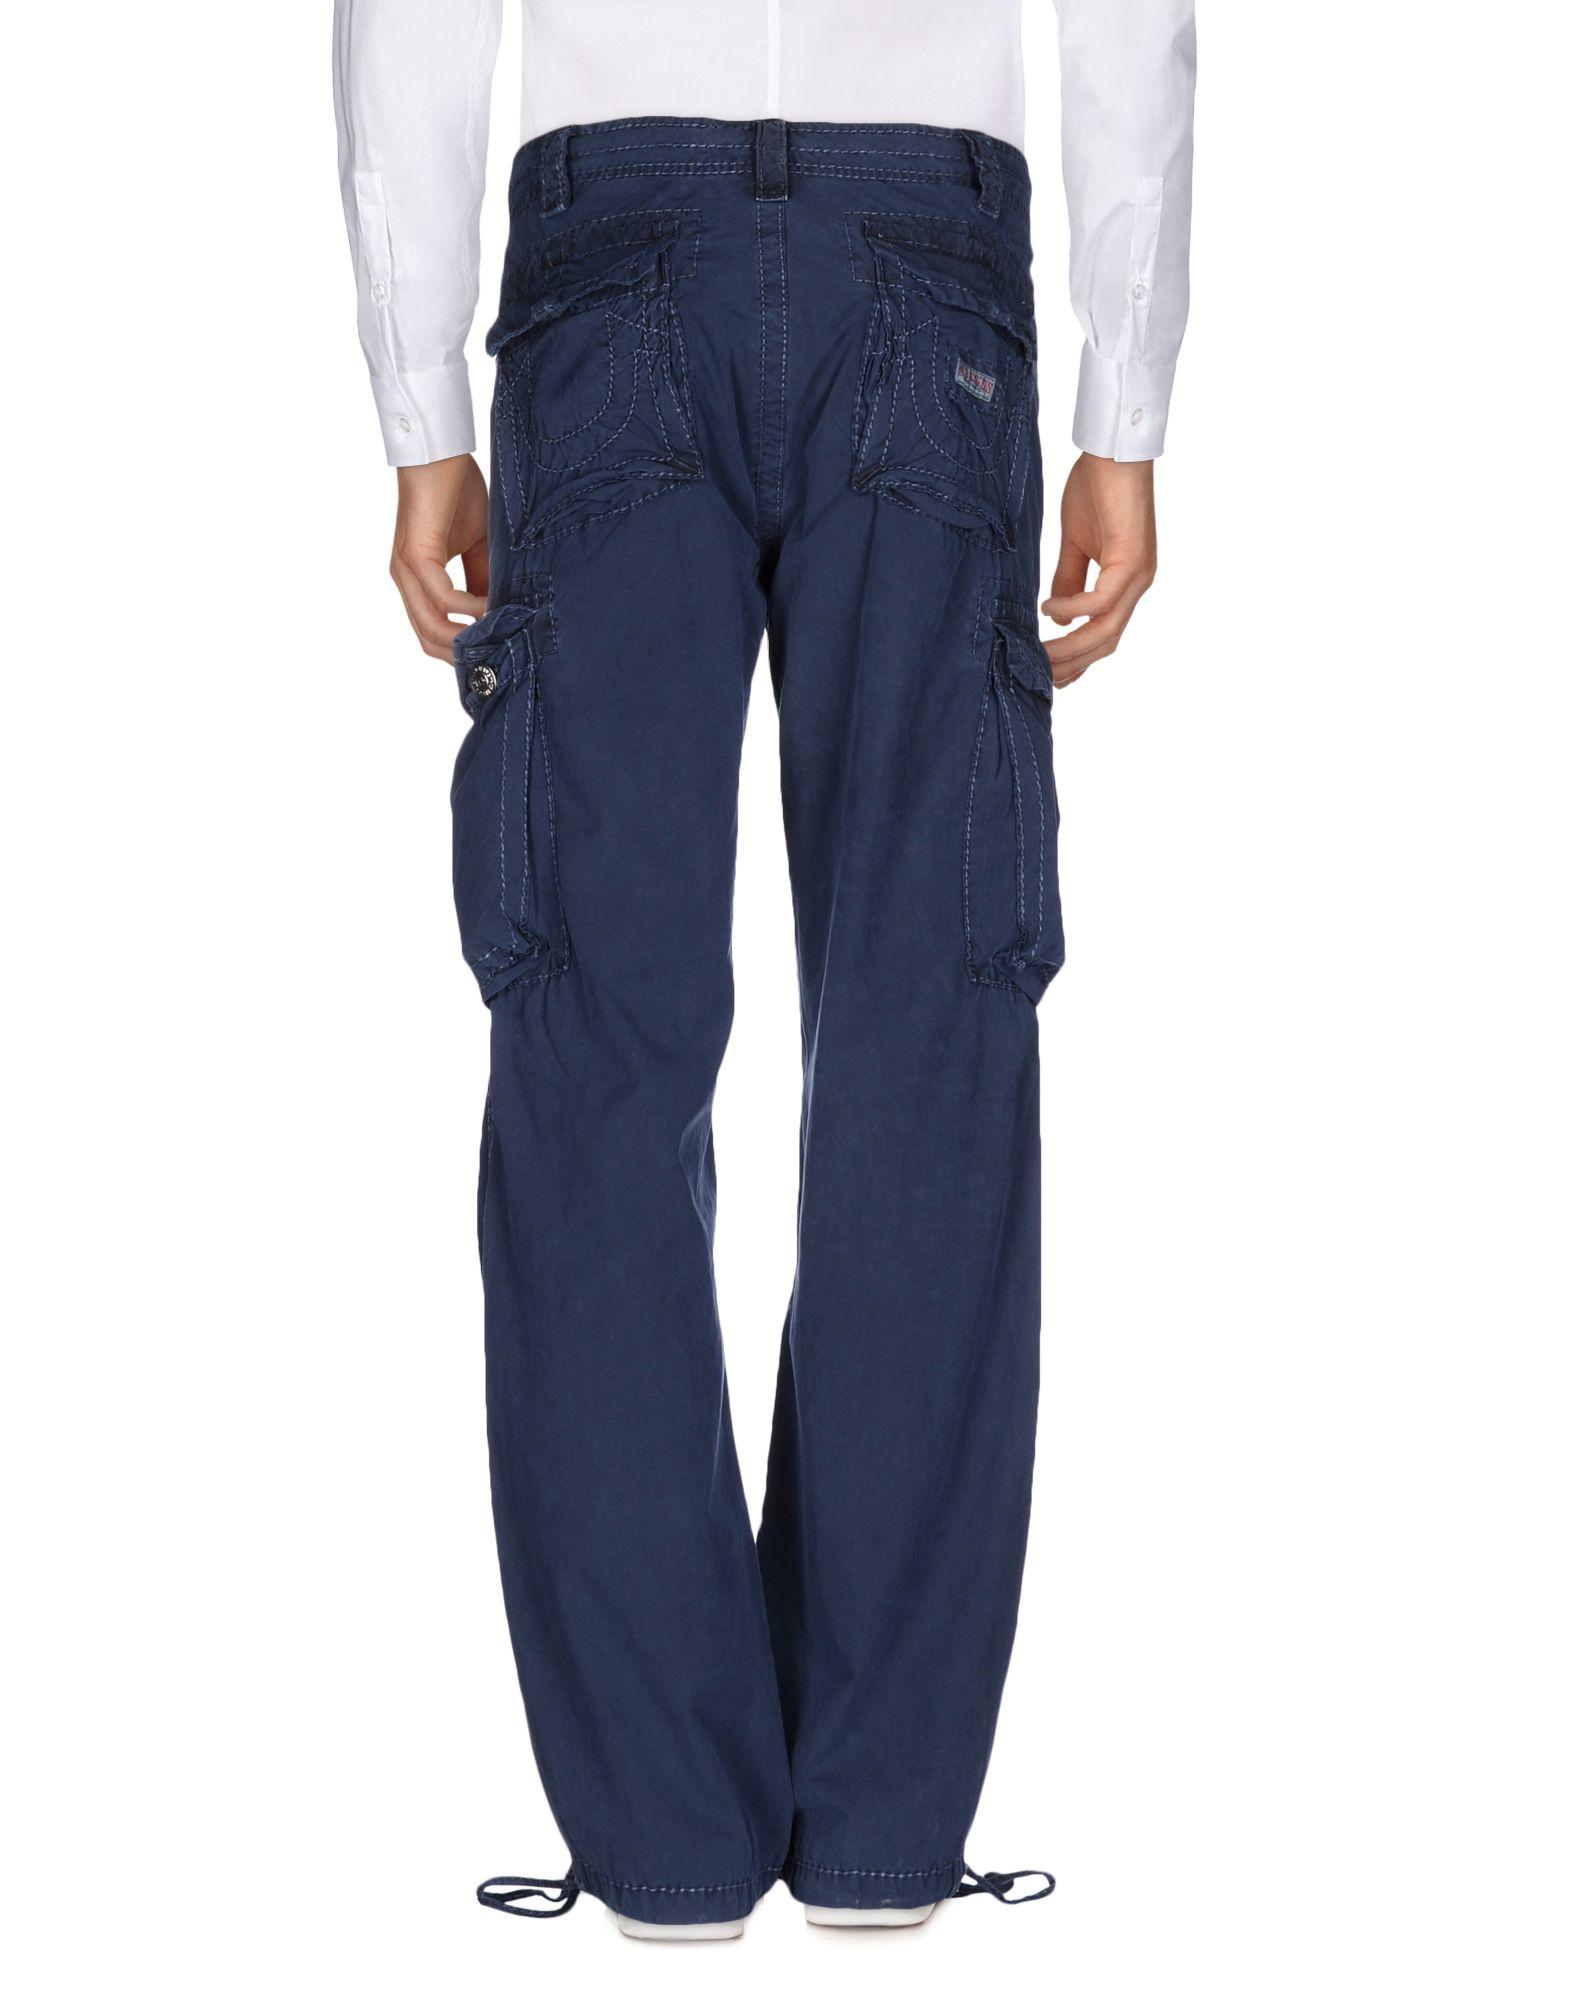 True Religion Cotton Casual Pants in Slate Blue (Blue) for Men